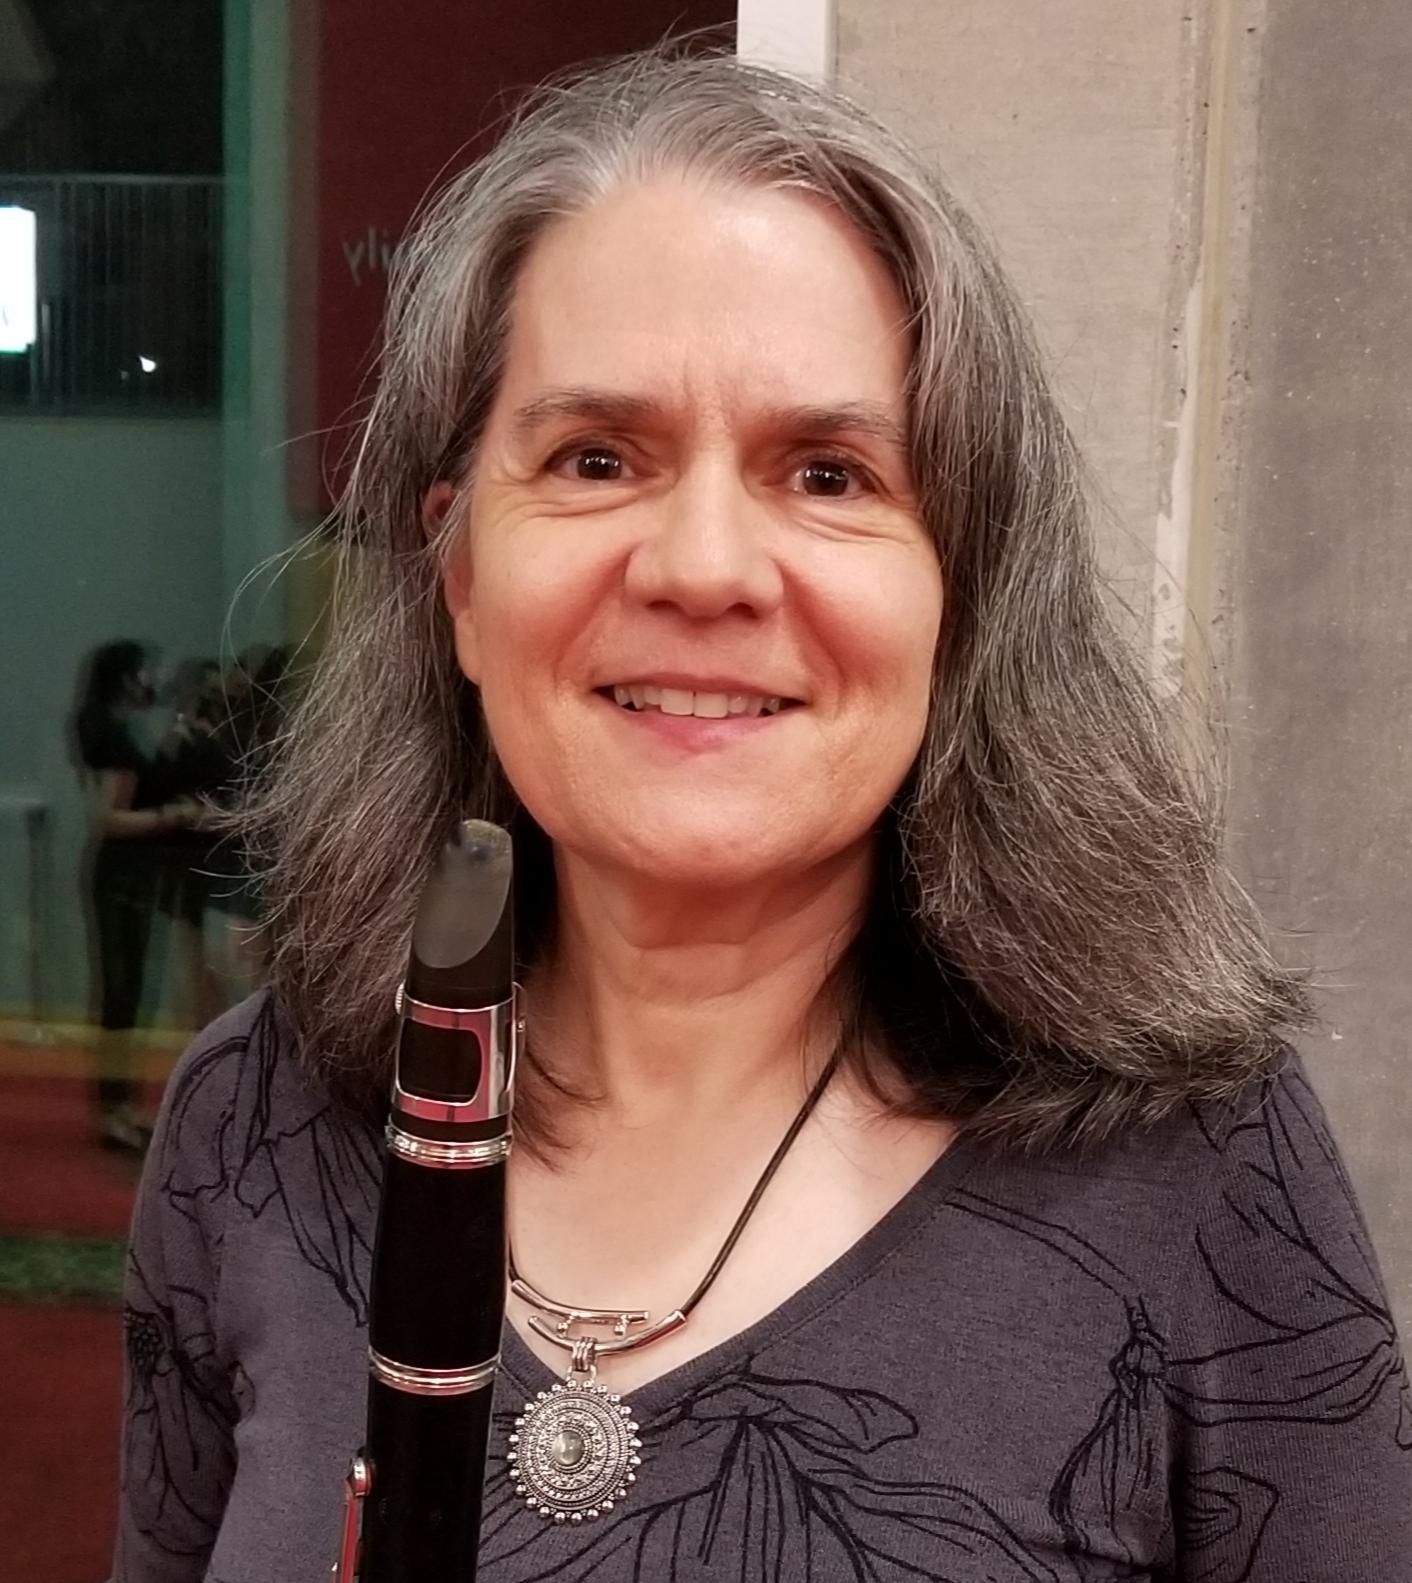 Michele Gingras